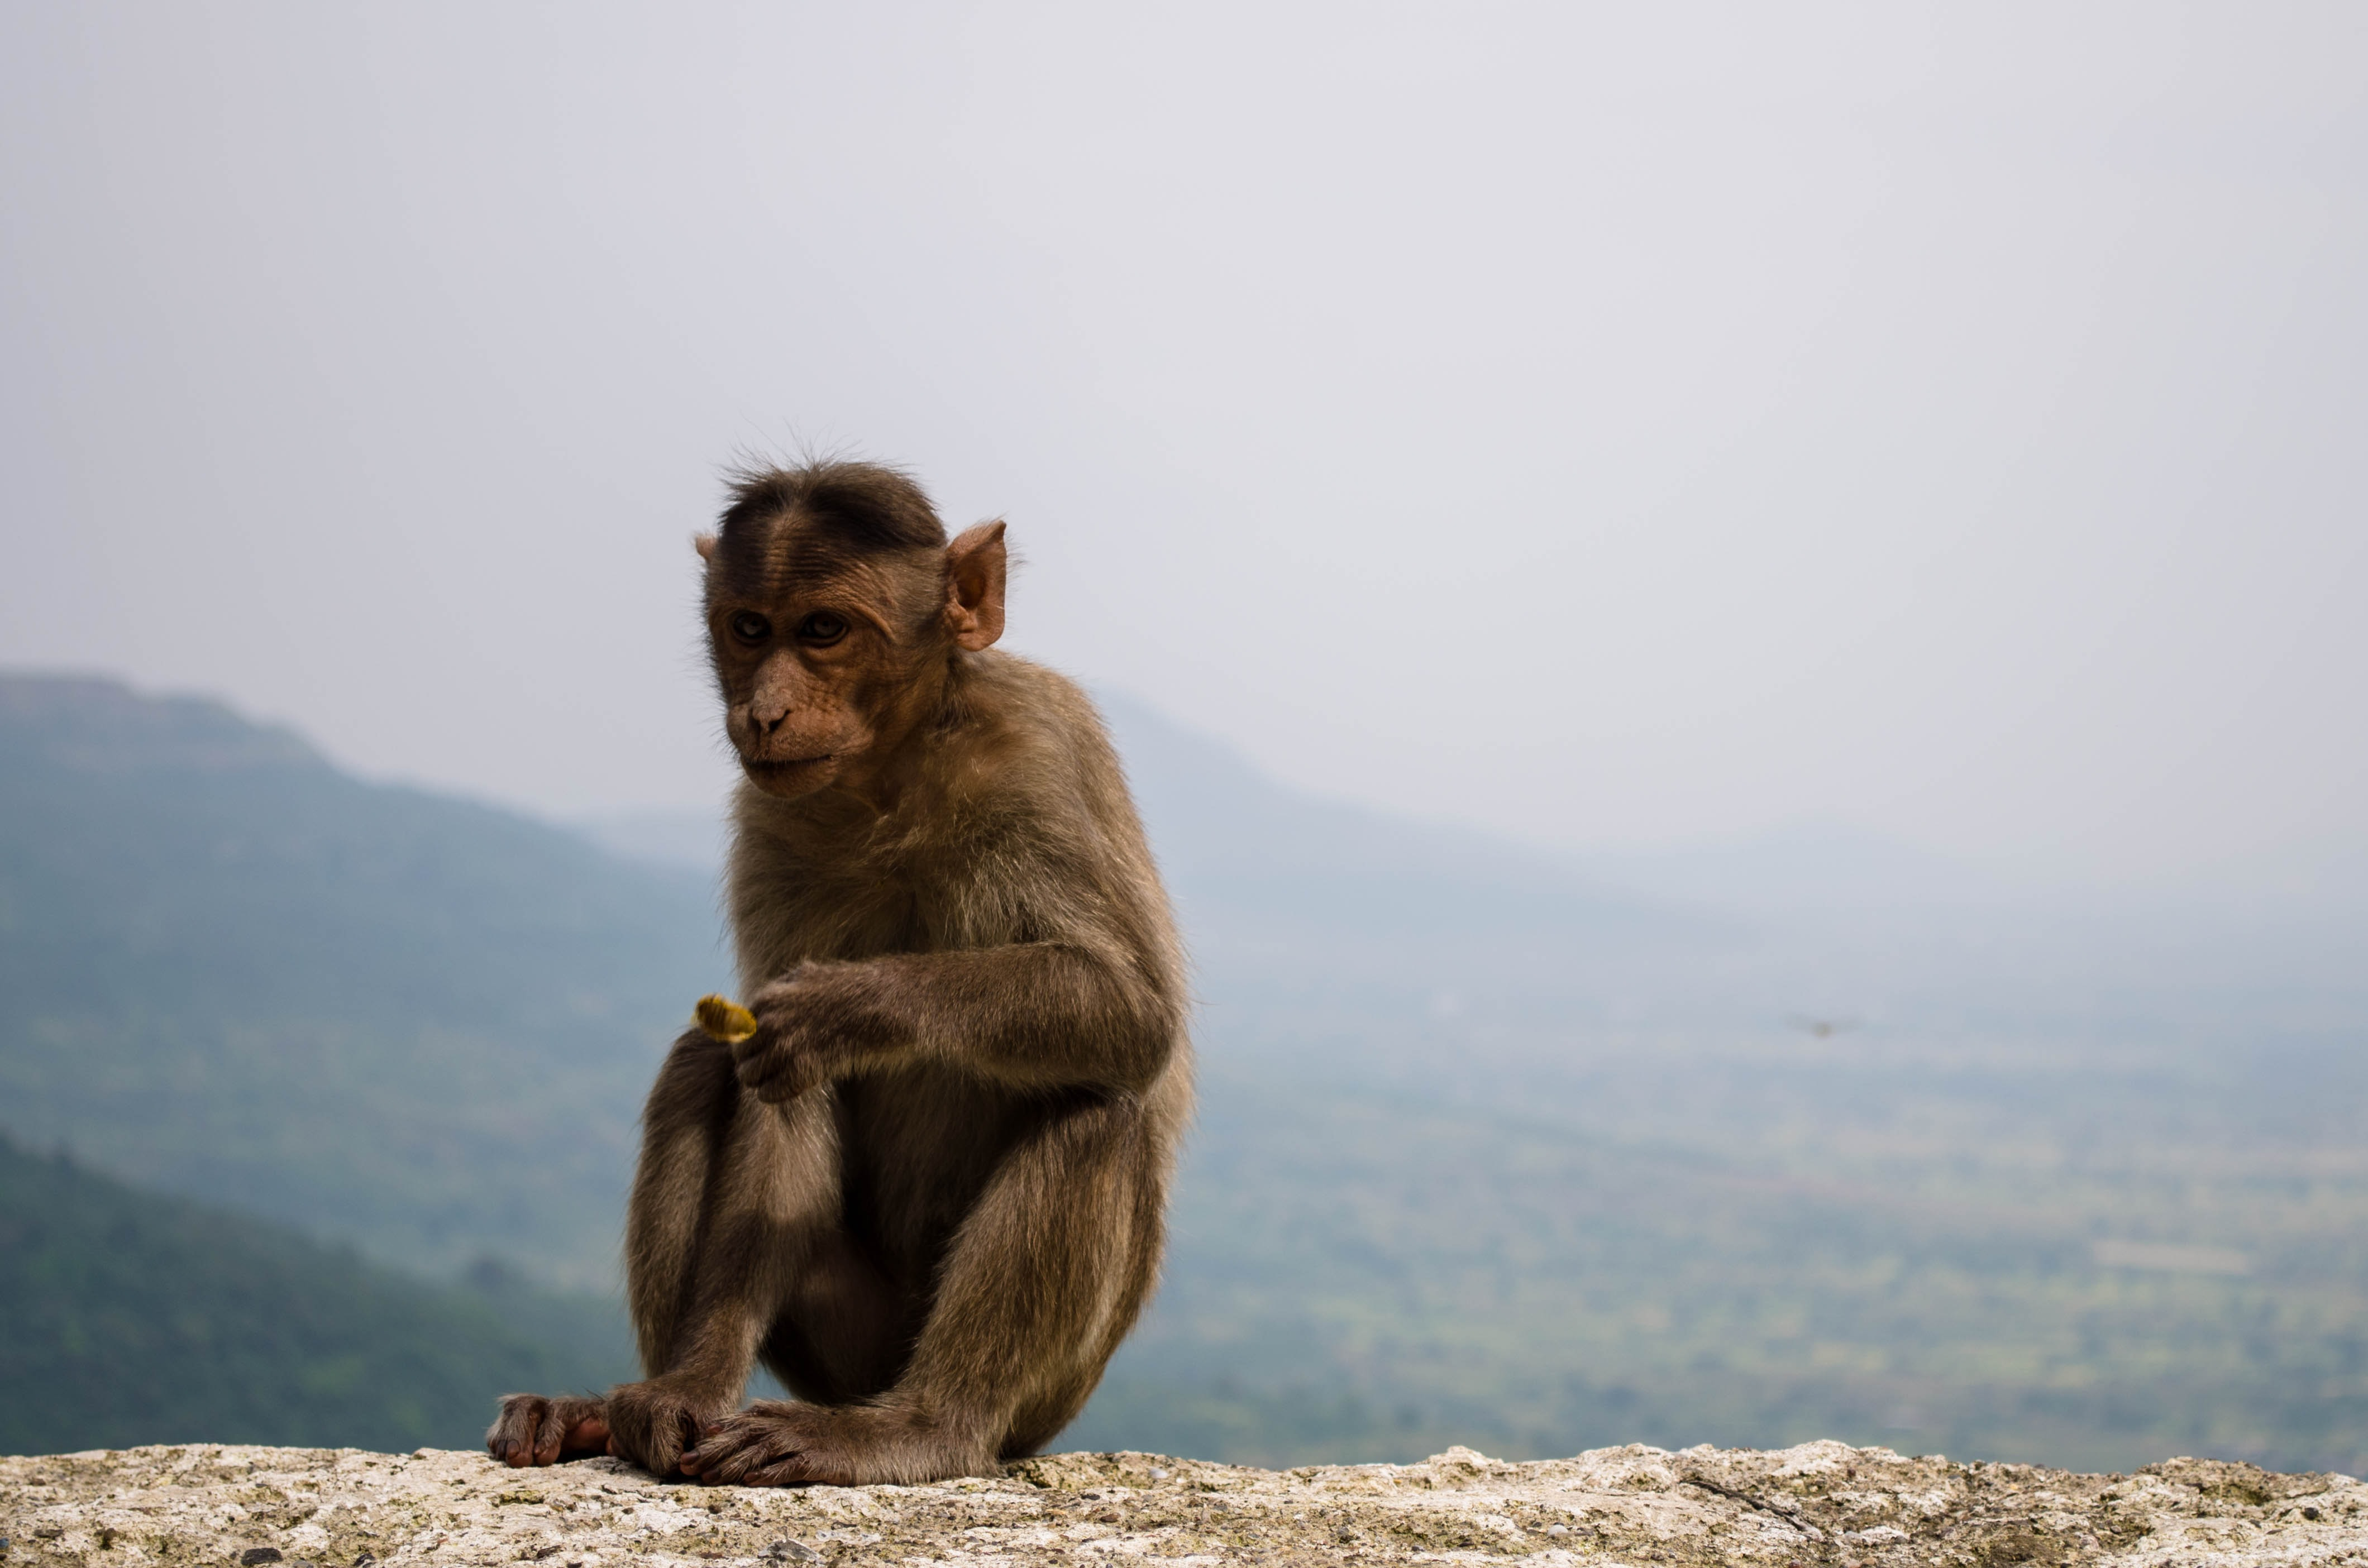 brown monkey sitting on gray stone at daytime